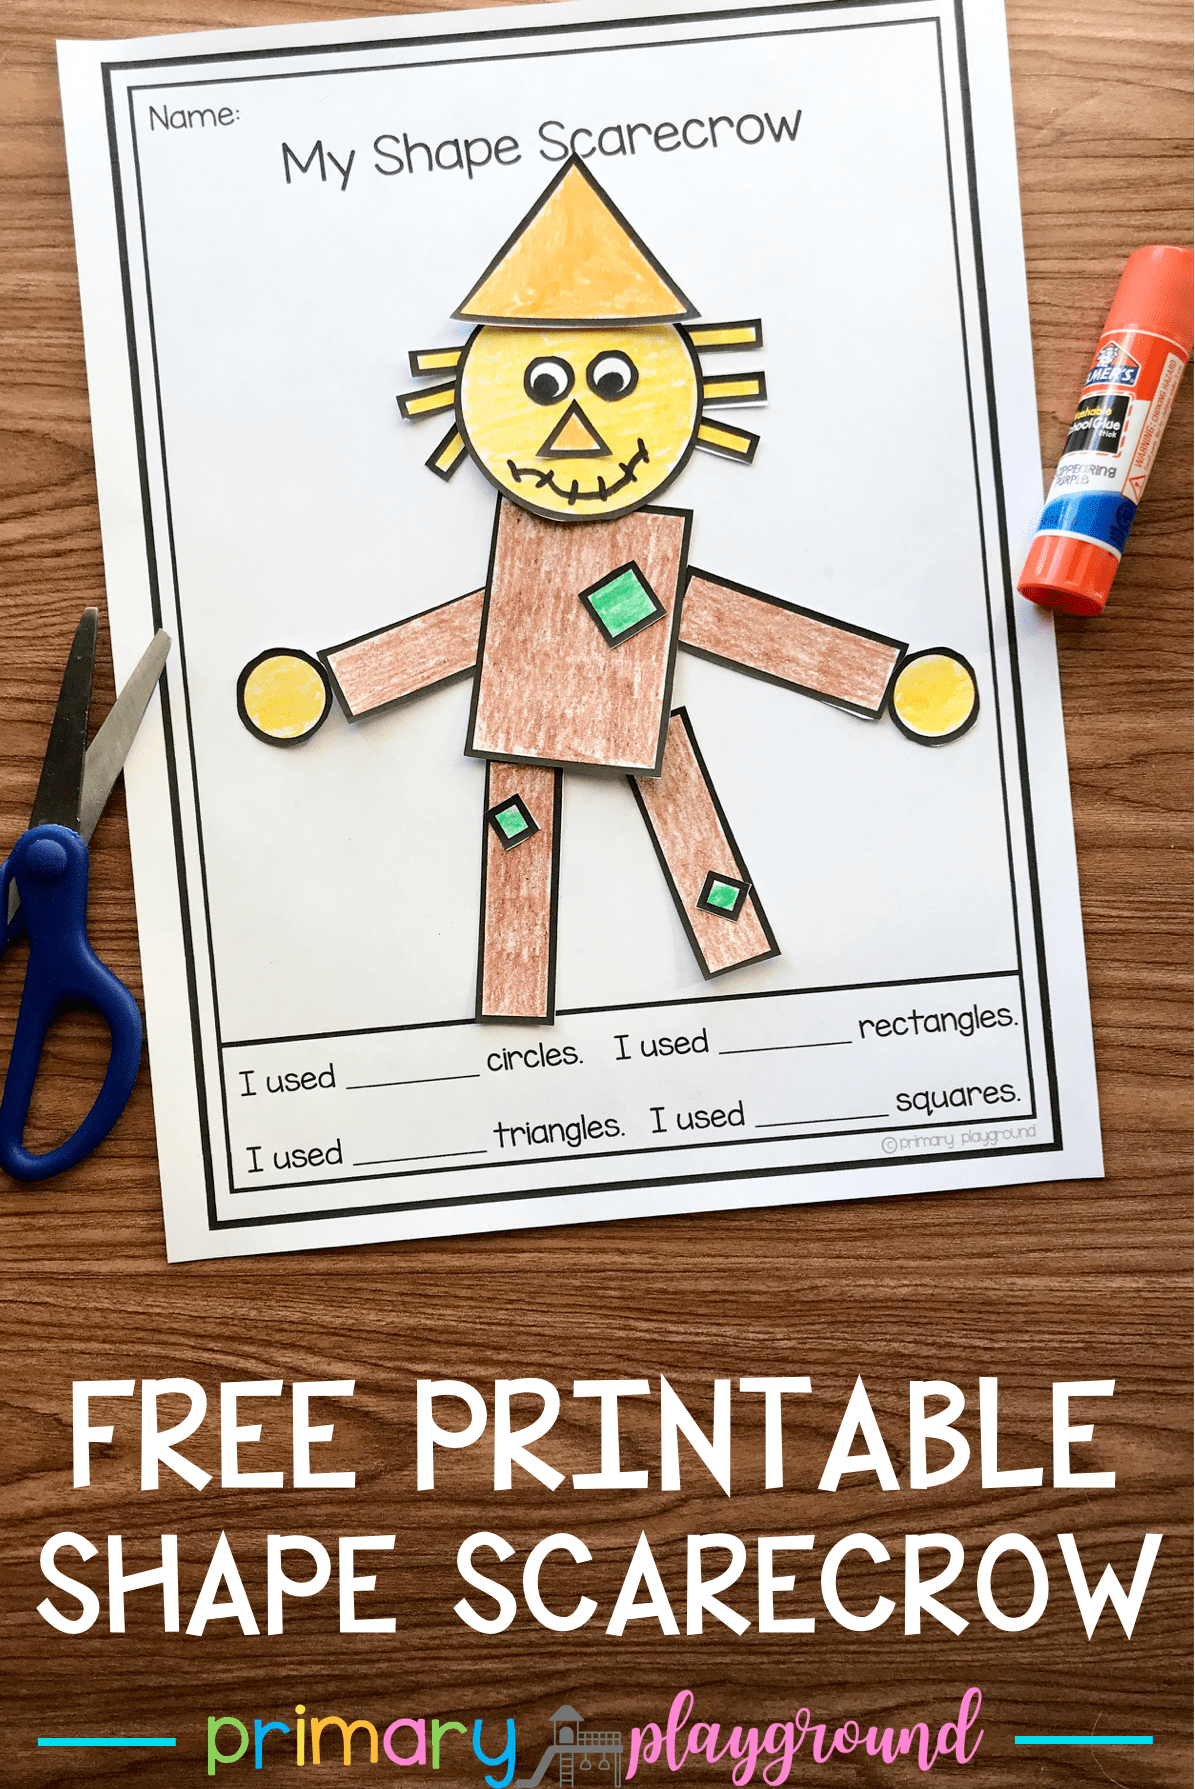 Kinder Garden: Free Printable 2D Shape Scarecrow